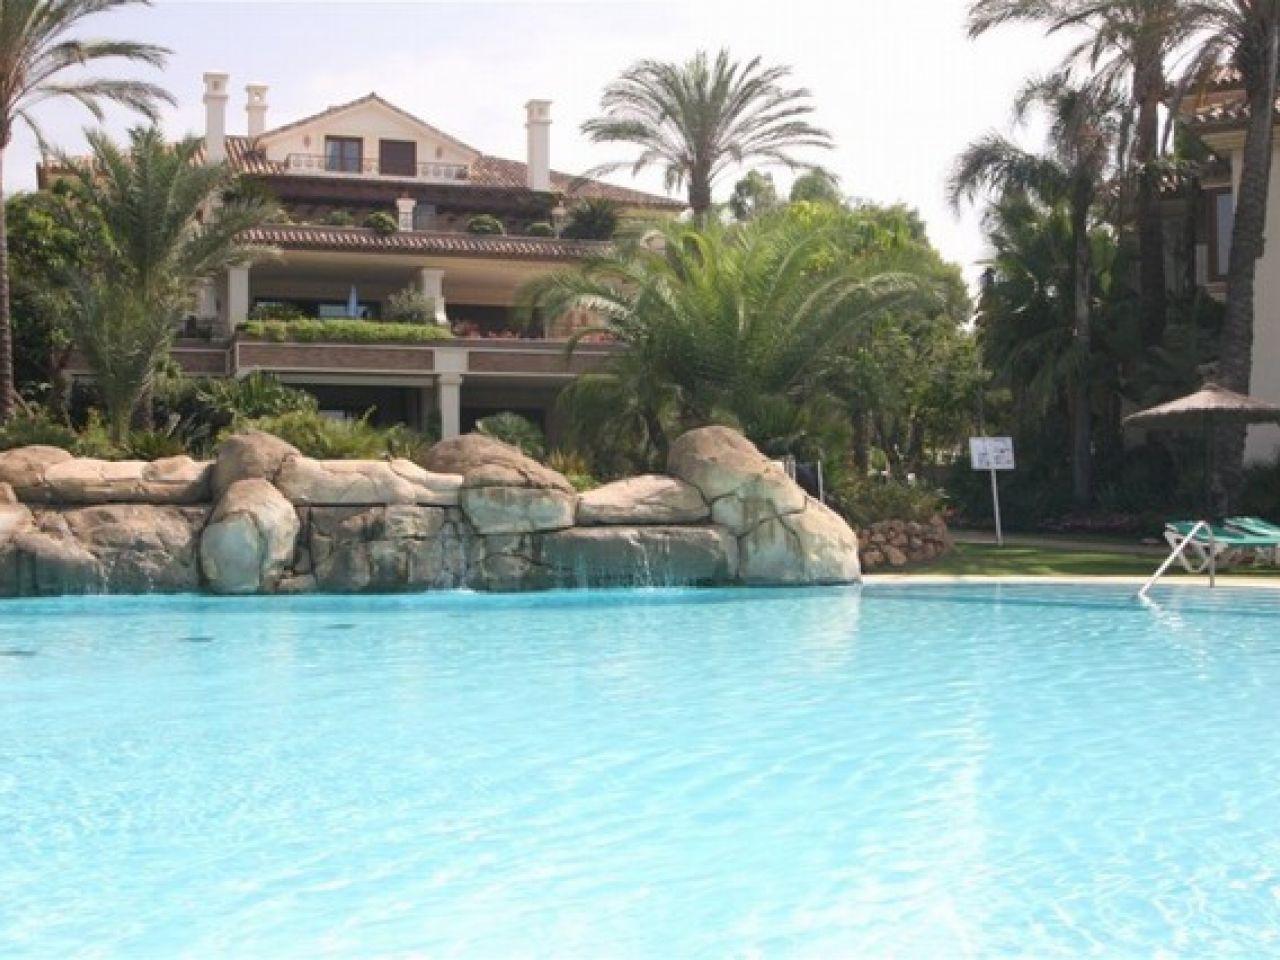 Apartment for Sale at Elegante apartamento zona playa Marbella Este Los Monteros Other Andalucia, Andalucia, 29600 Spain